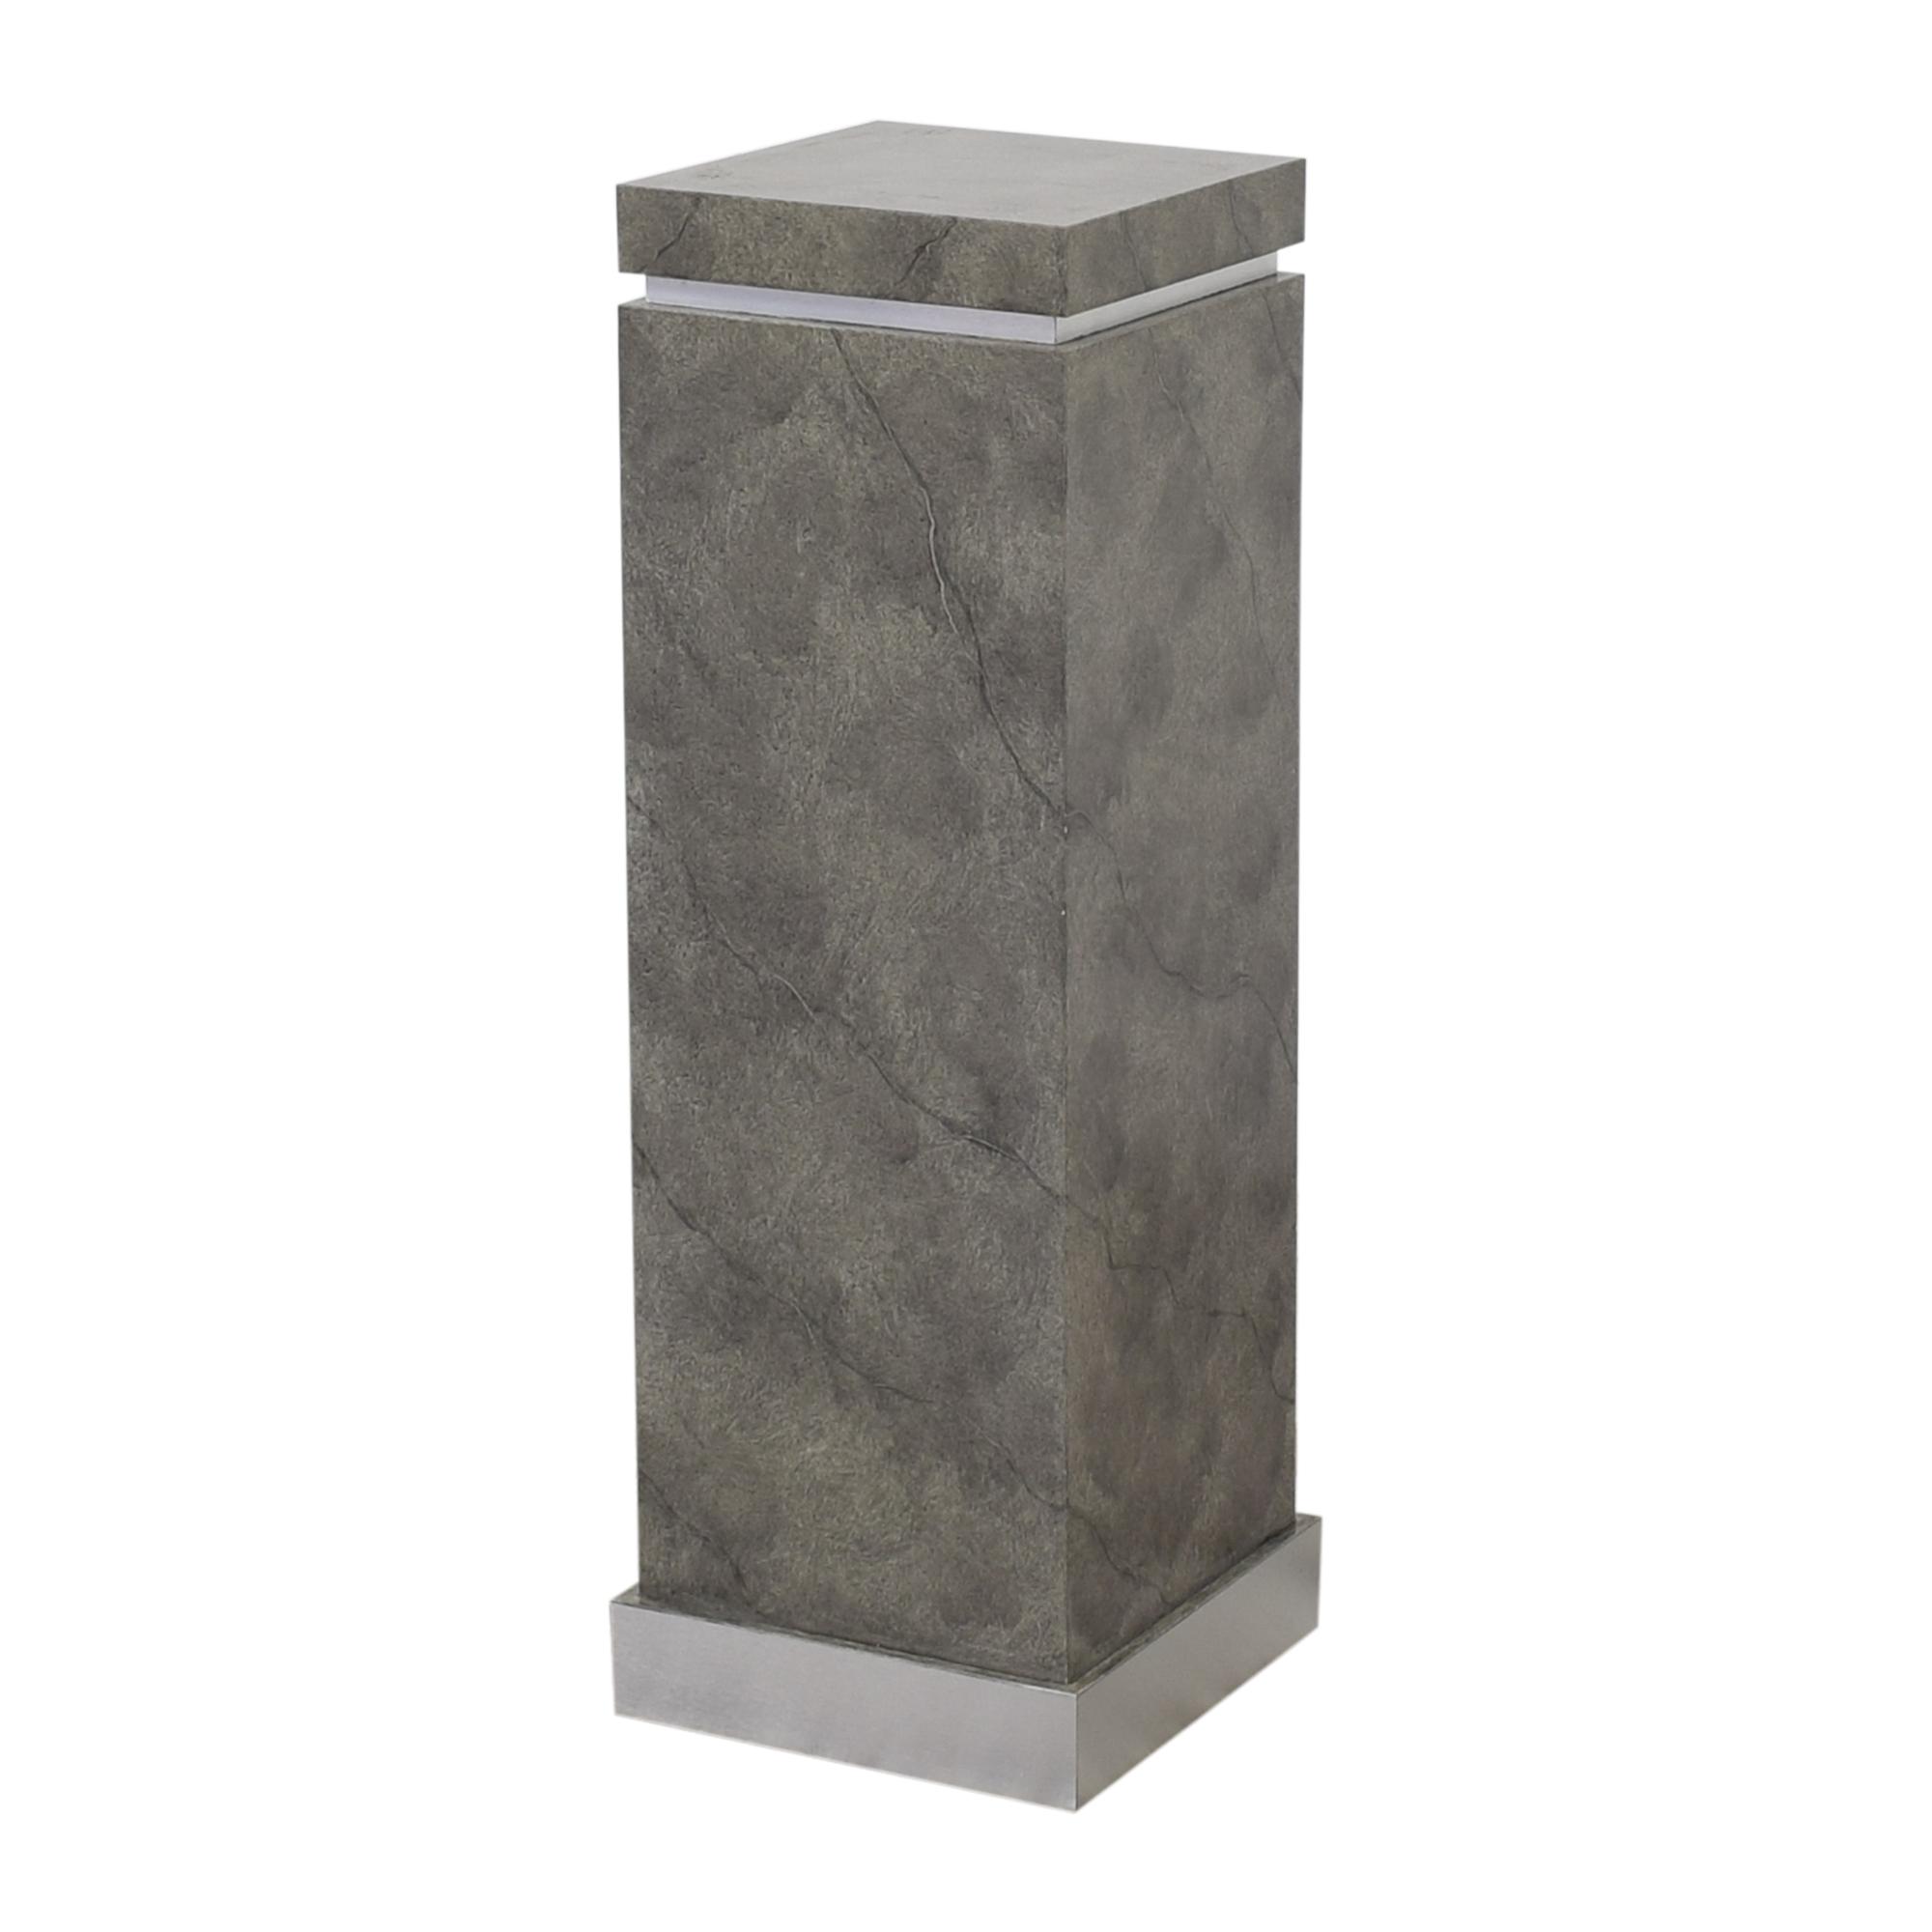 Decorative Pedestal price